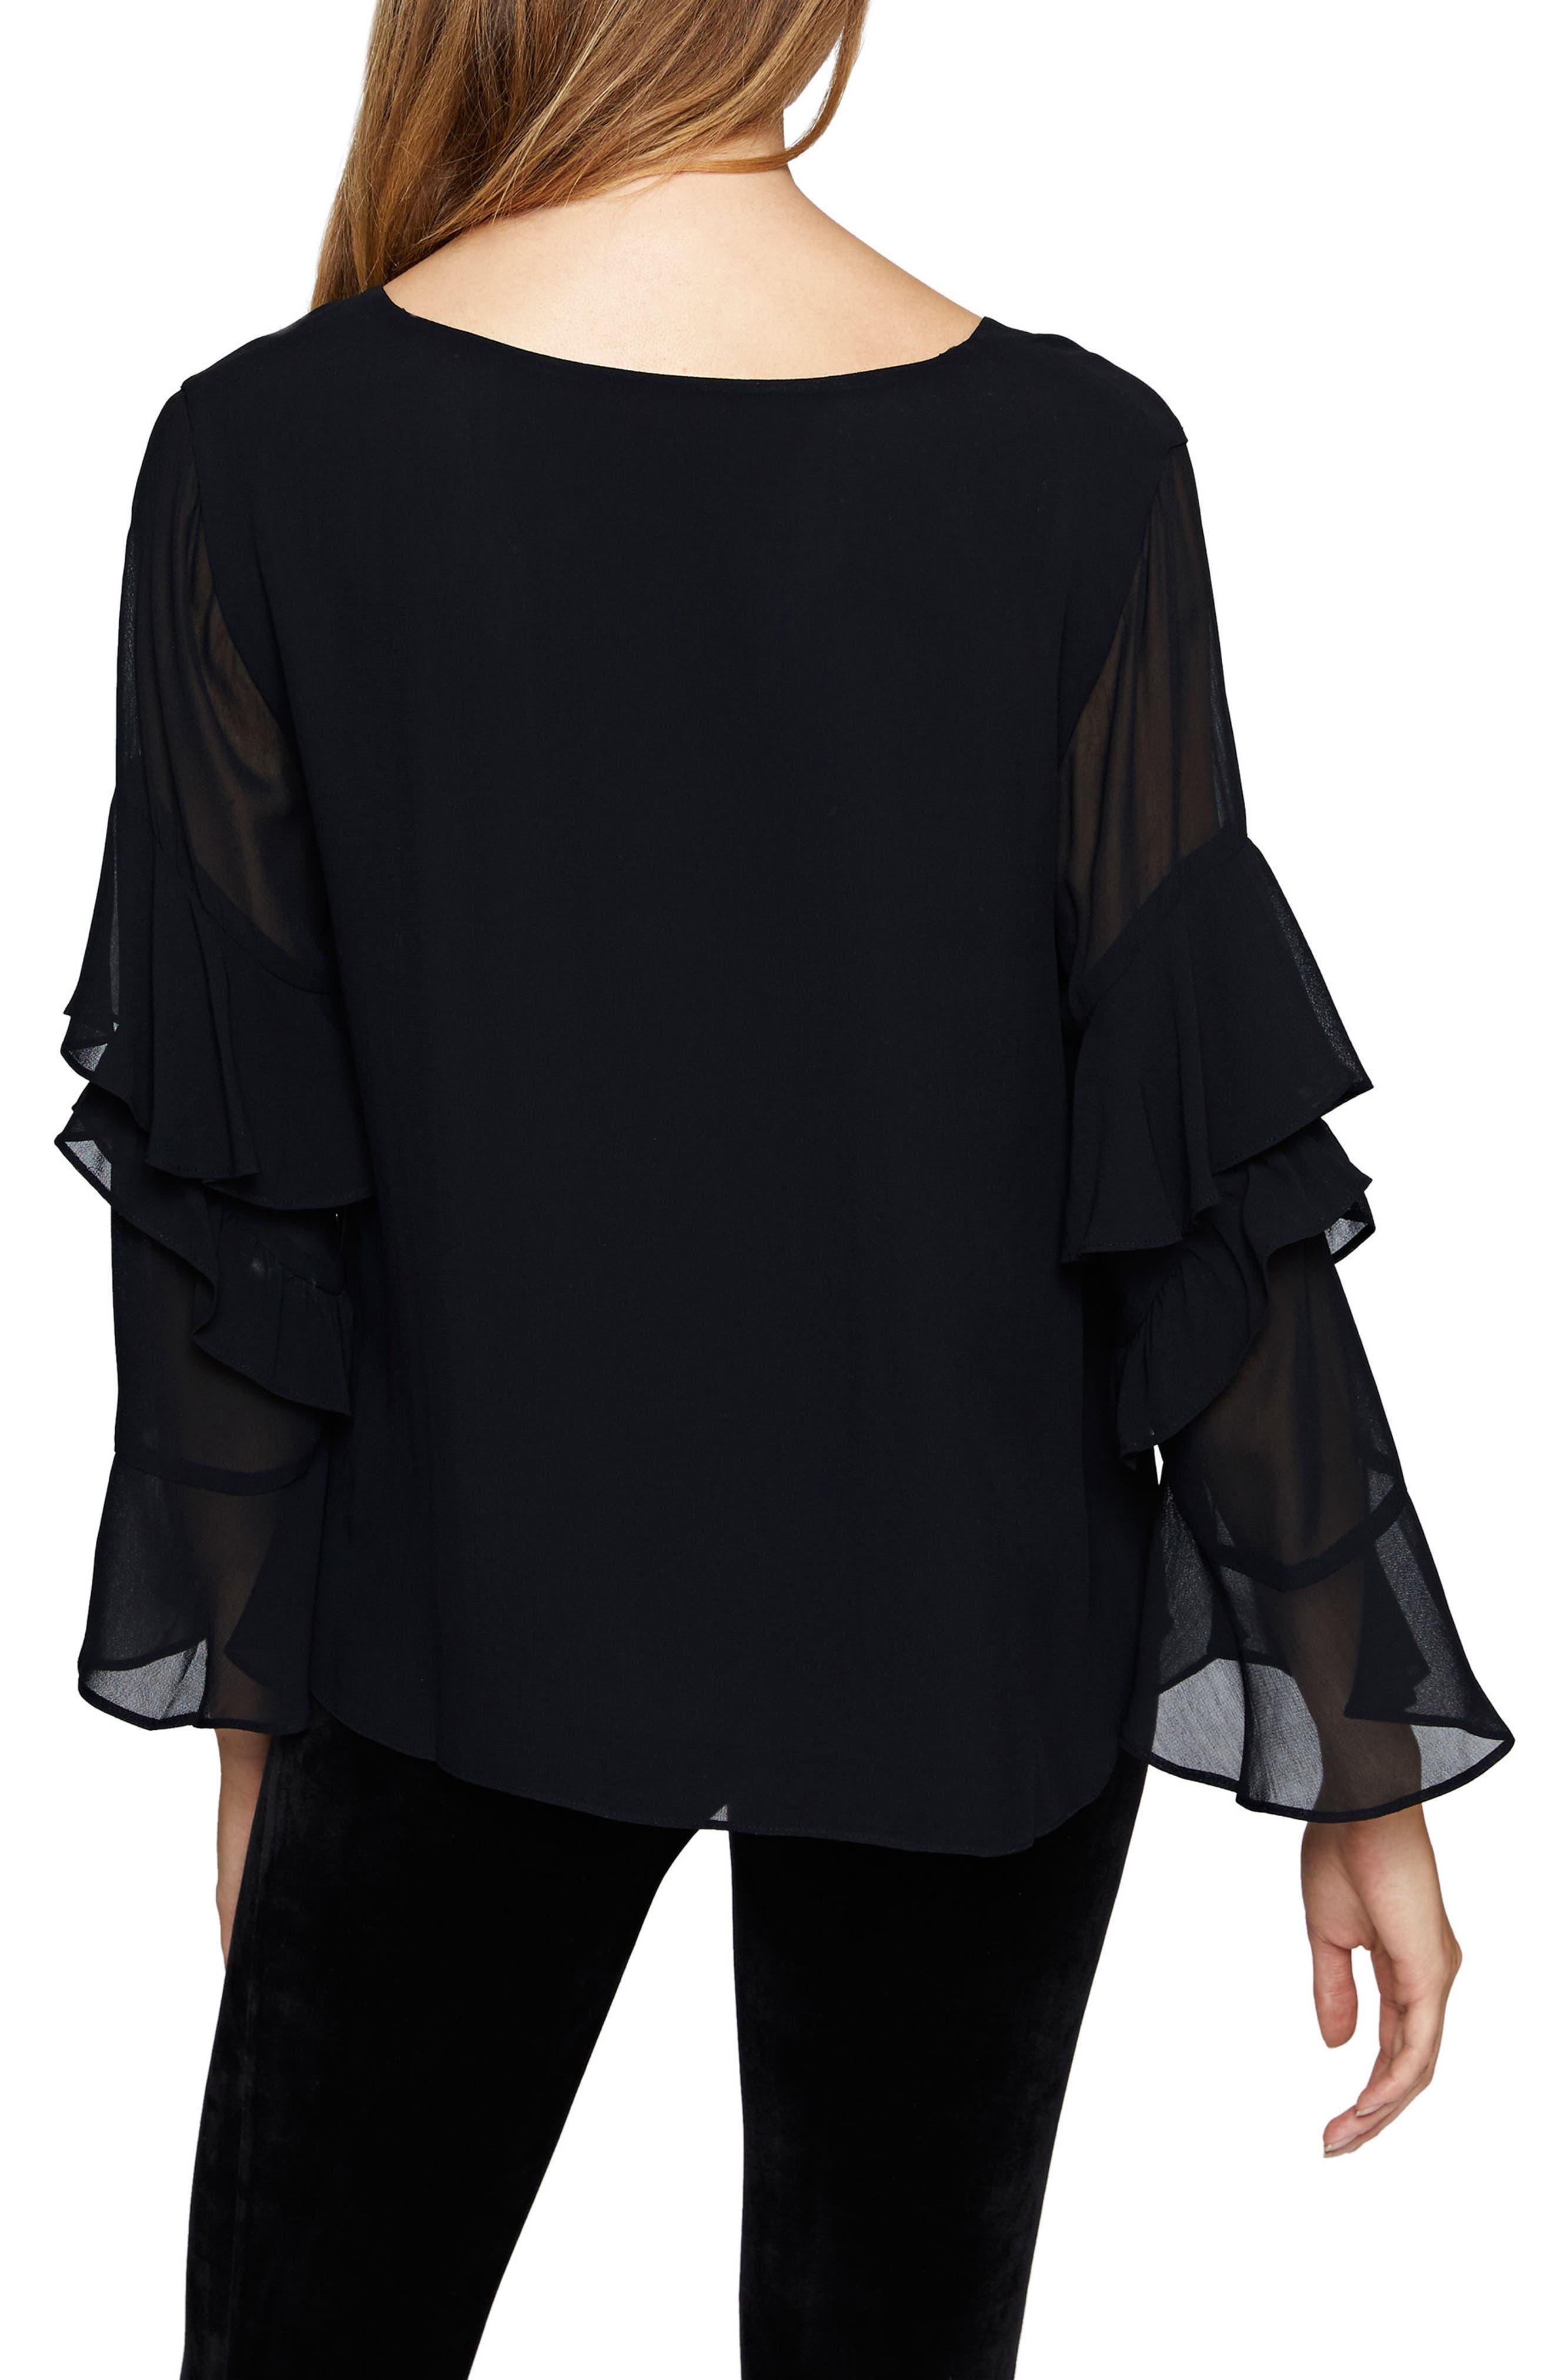 Bianca Sheer Sleeve Top,                             Alternate thumbnail 2, color,                             Black